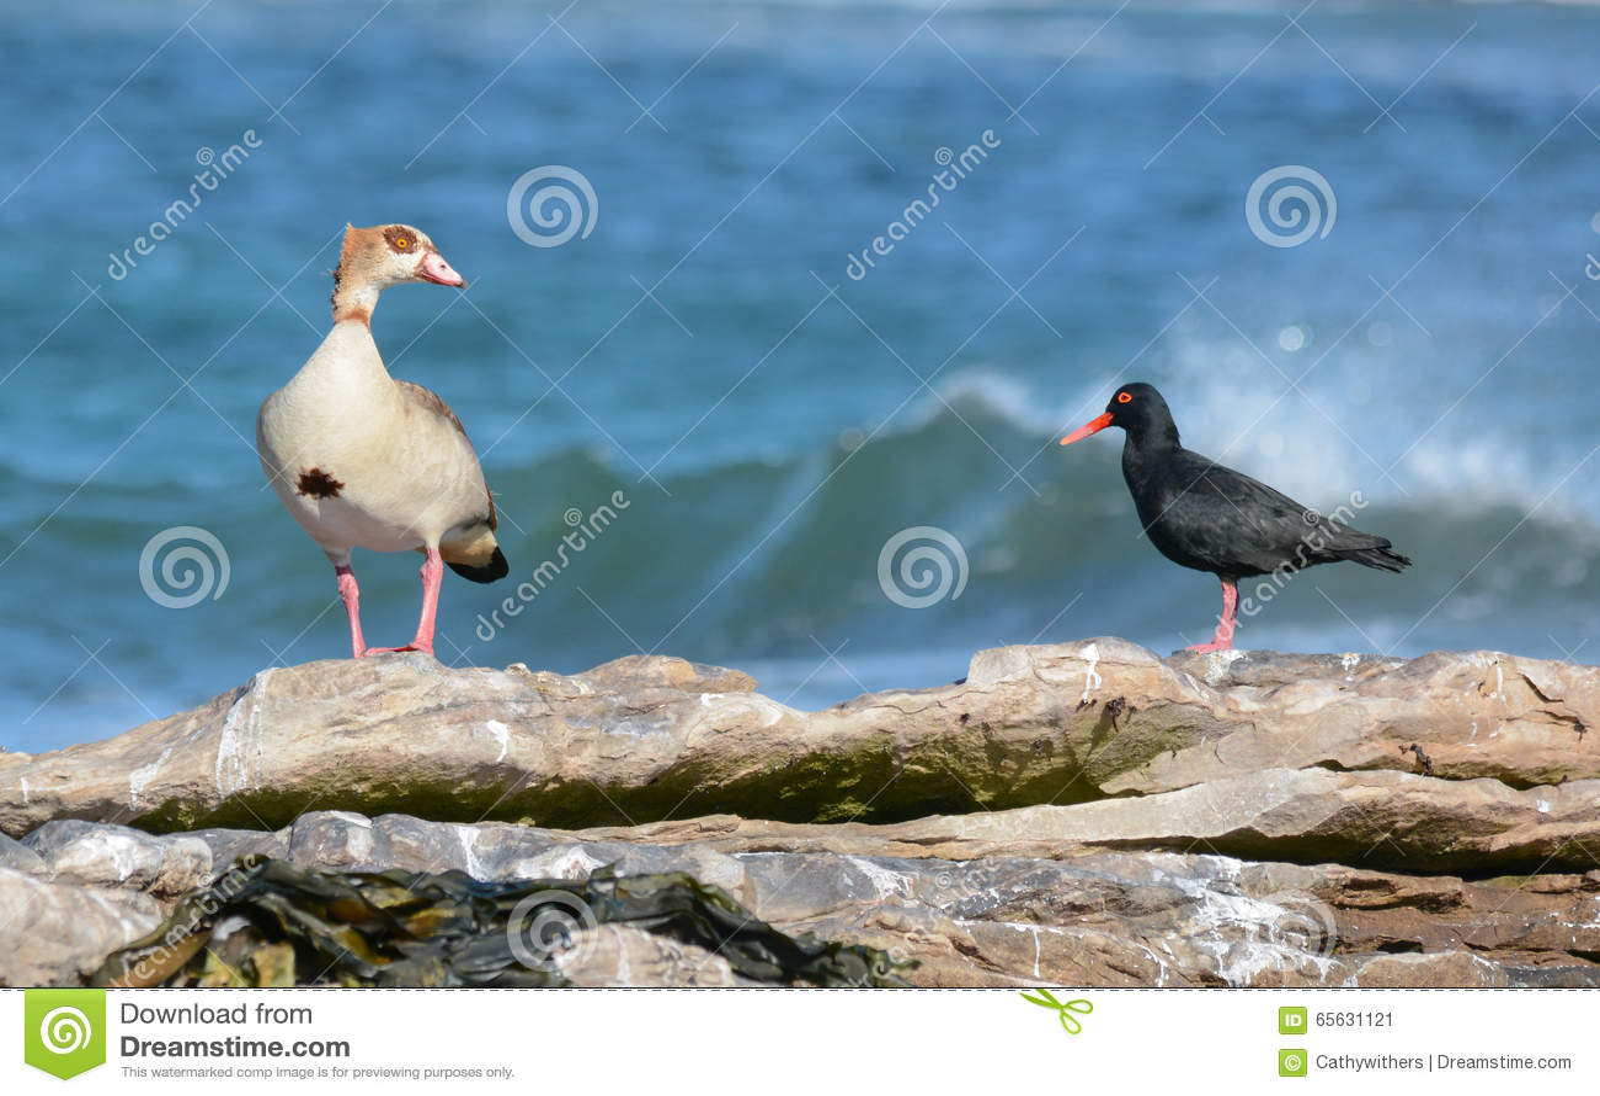 Oie égyptienne et huîtrier noir africain